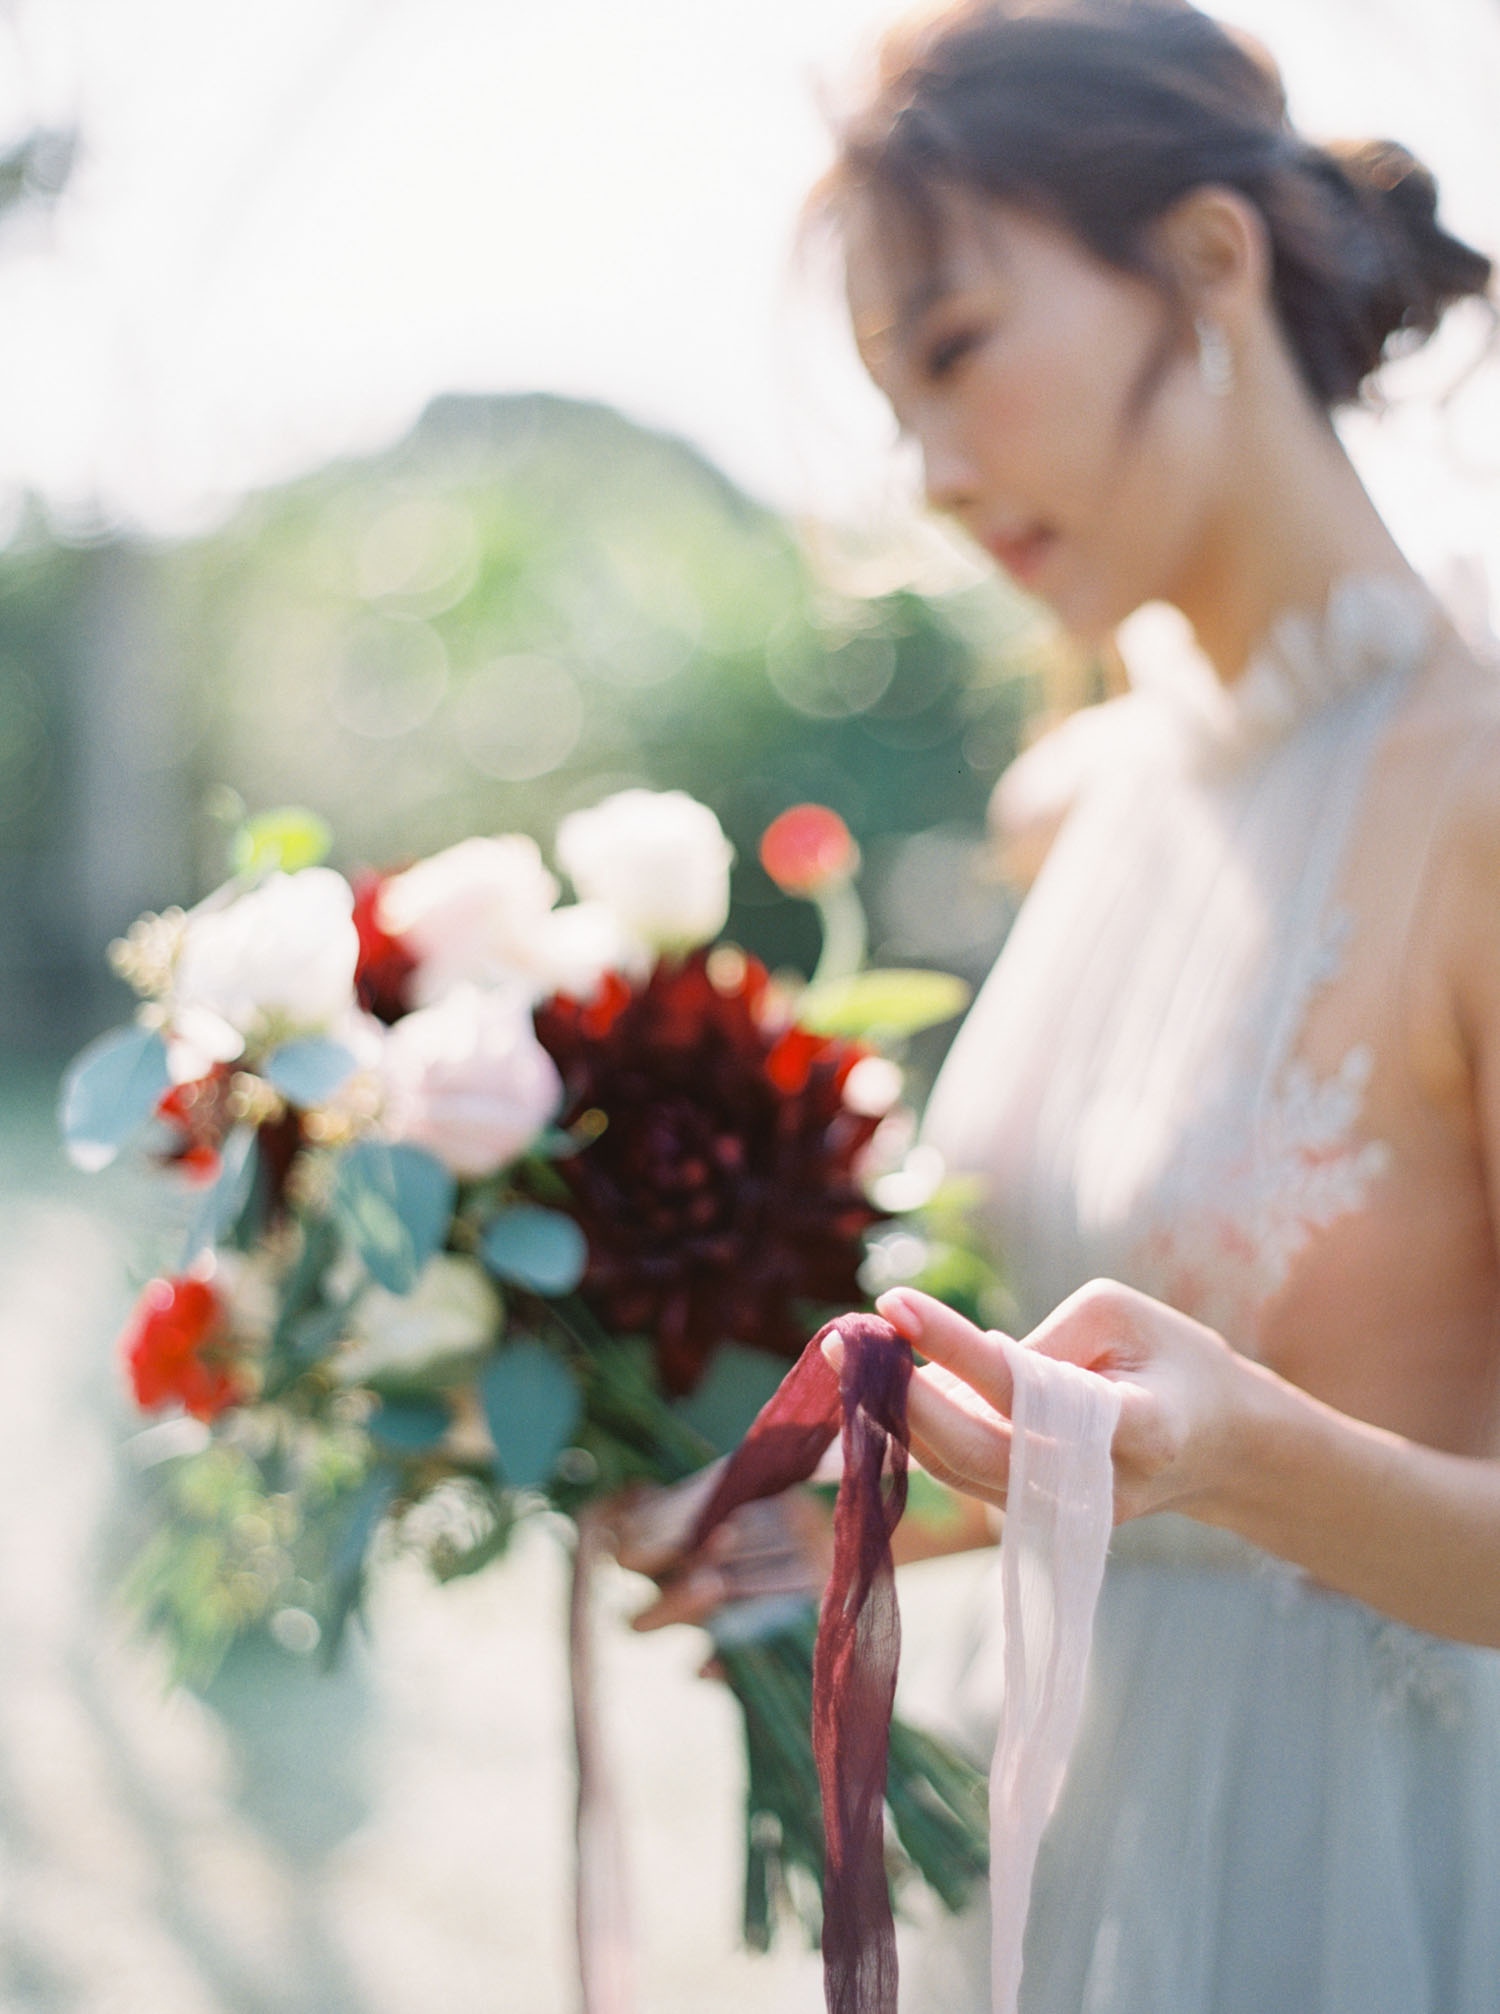 Christy 陳瑋薇 婚紗 唯諾婚紗 結婚